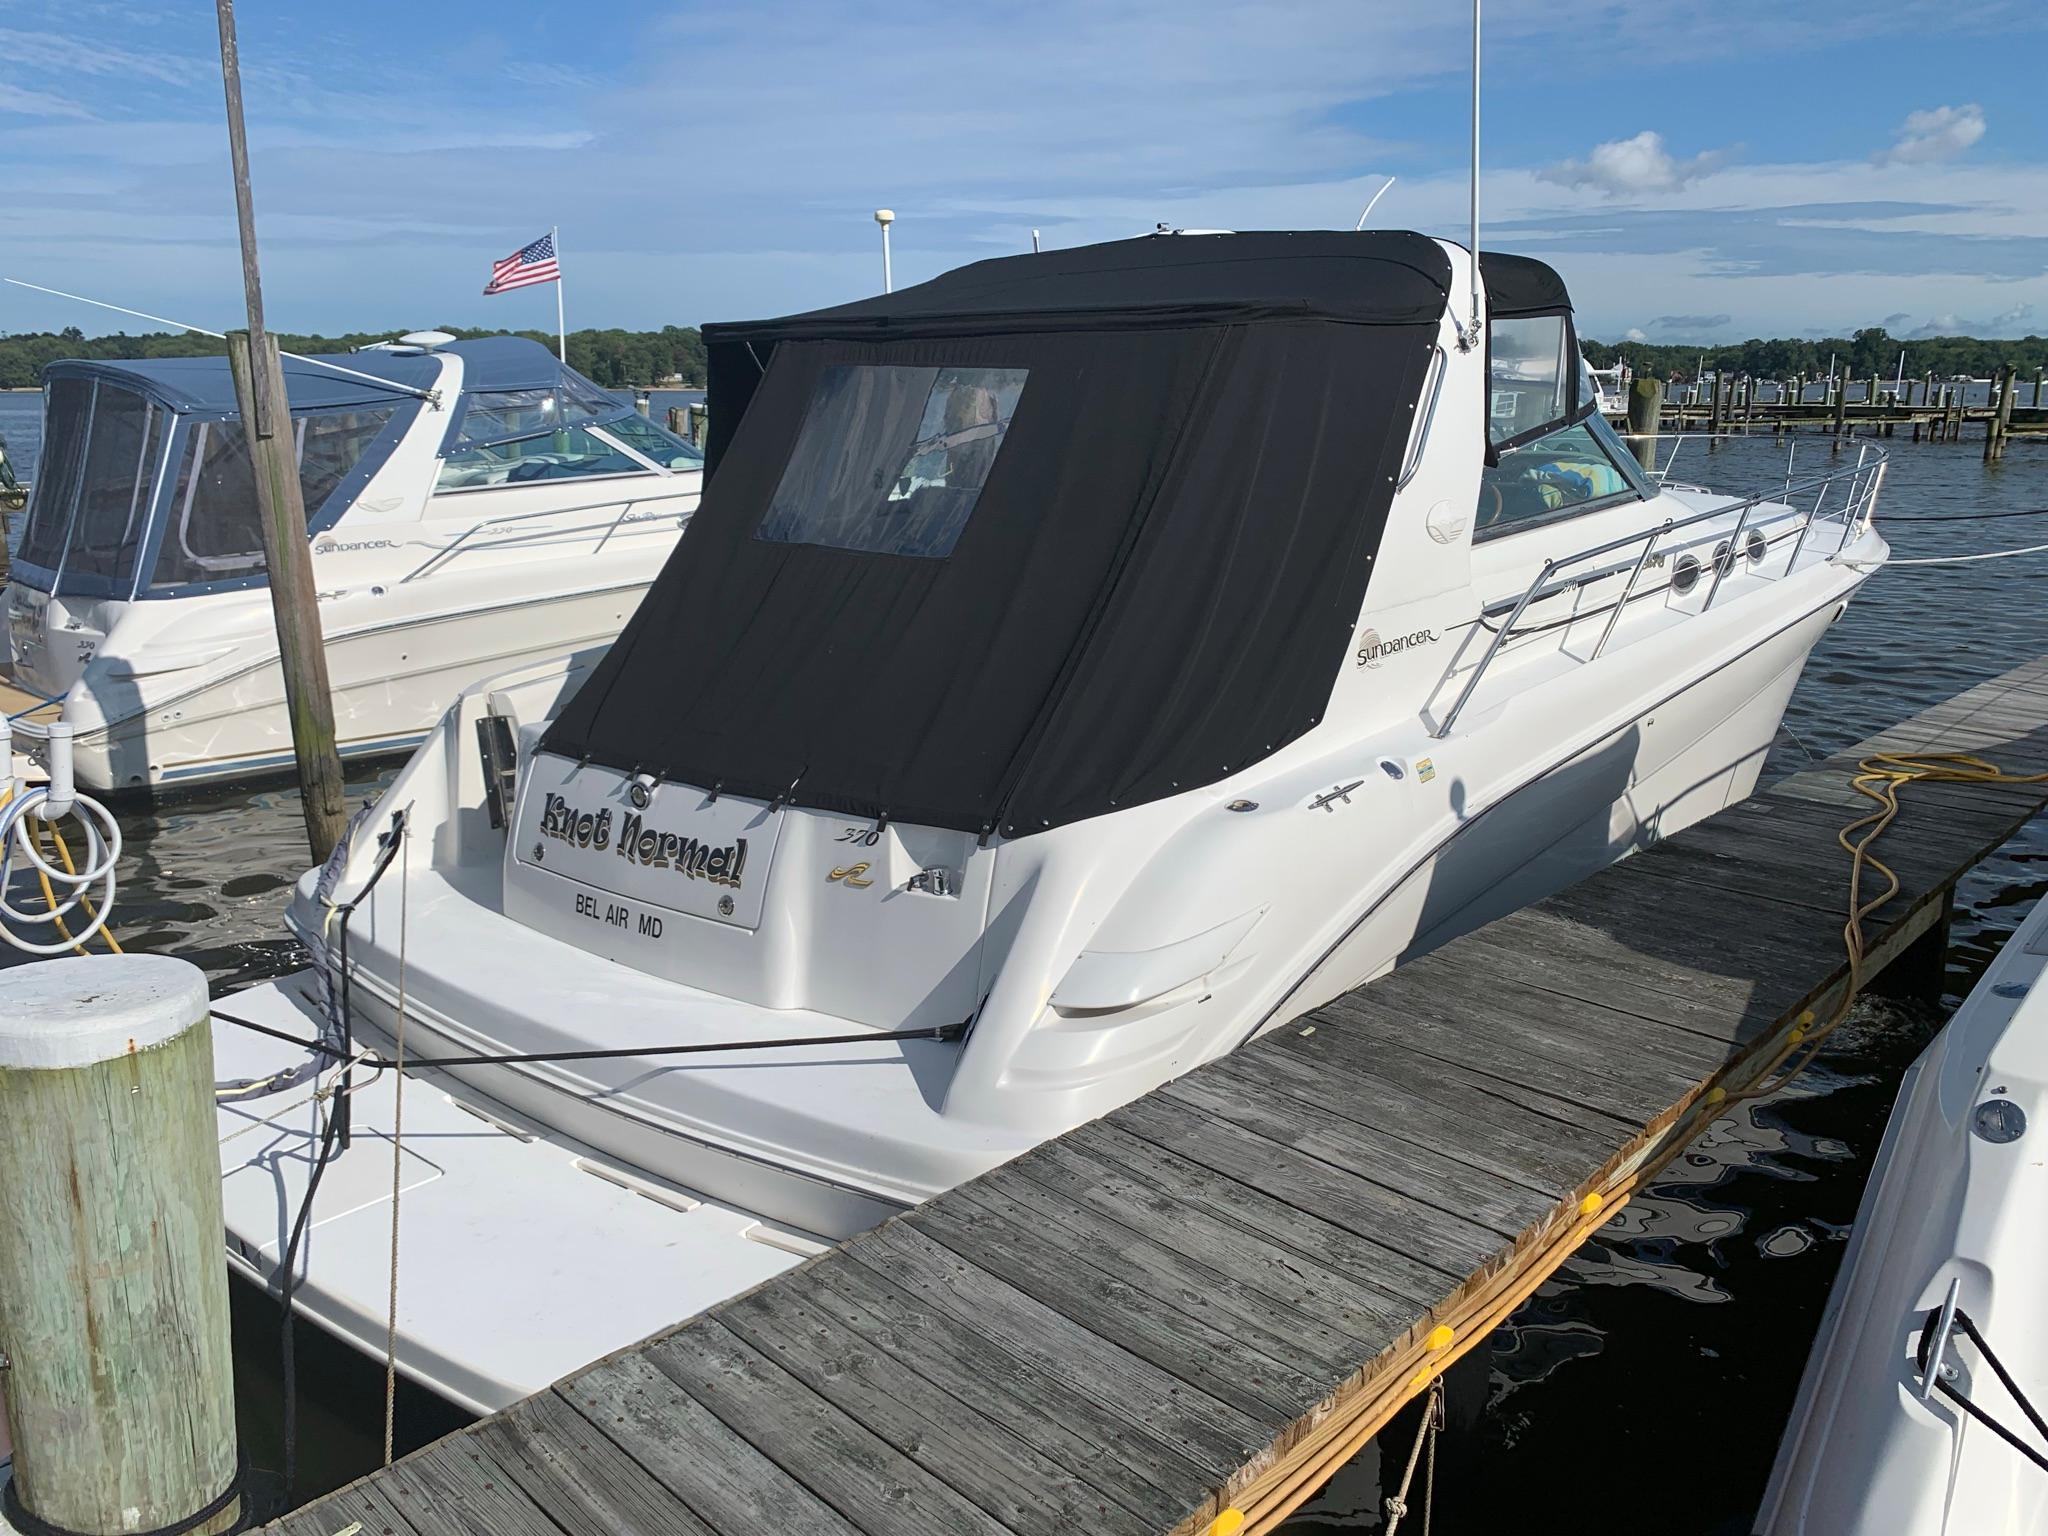 M 6400 VR Knot 10 Yacht Sales